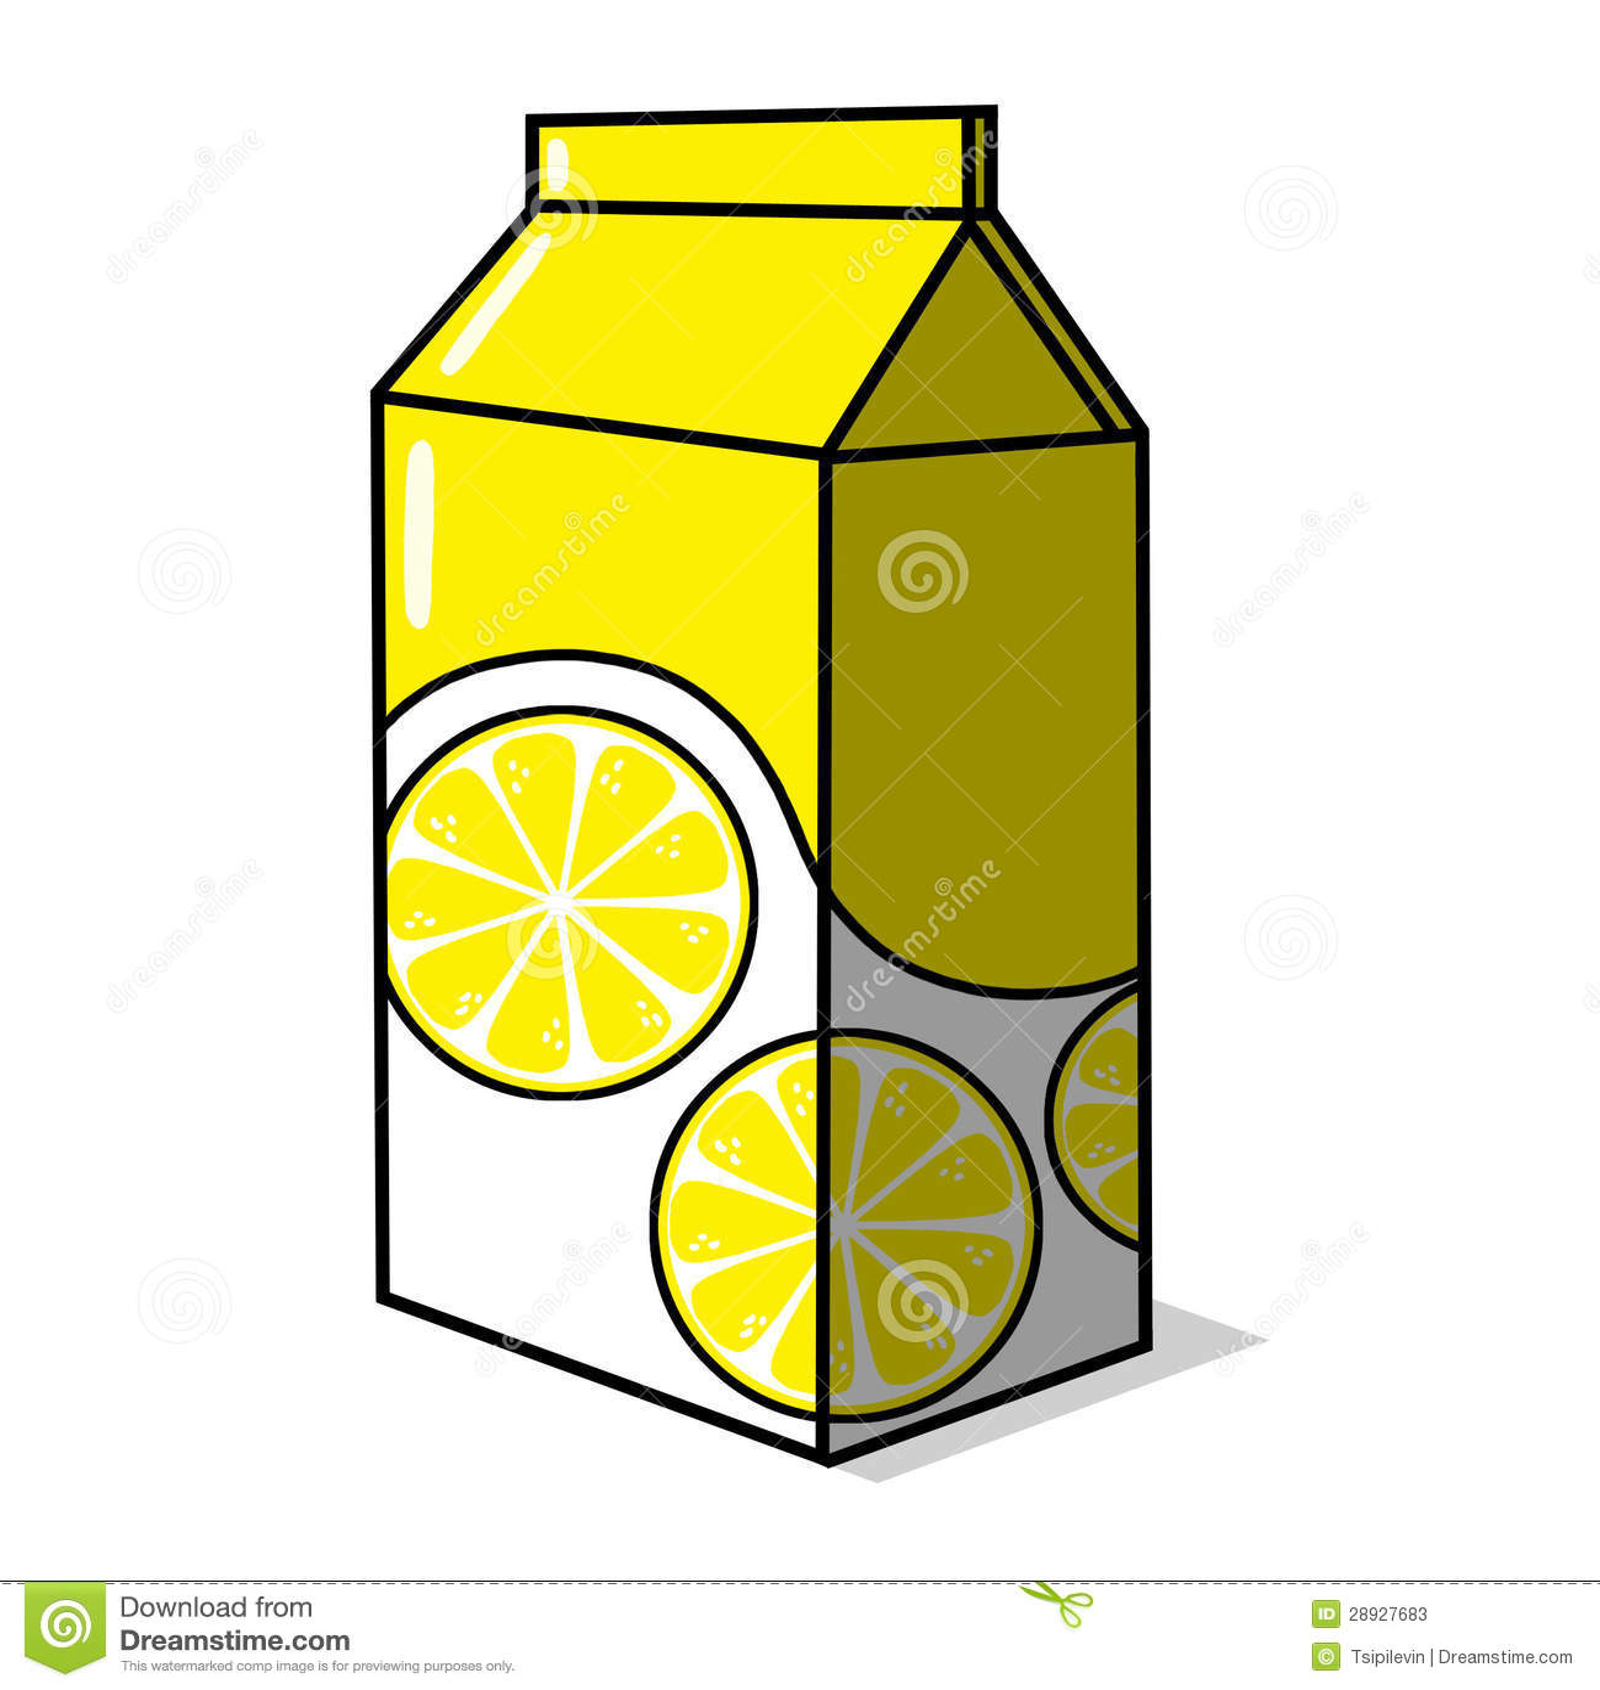 Lemonade Cartoon Lemonade carton illustration: galleryhip.com/lemonade-cartoon.html